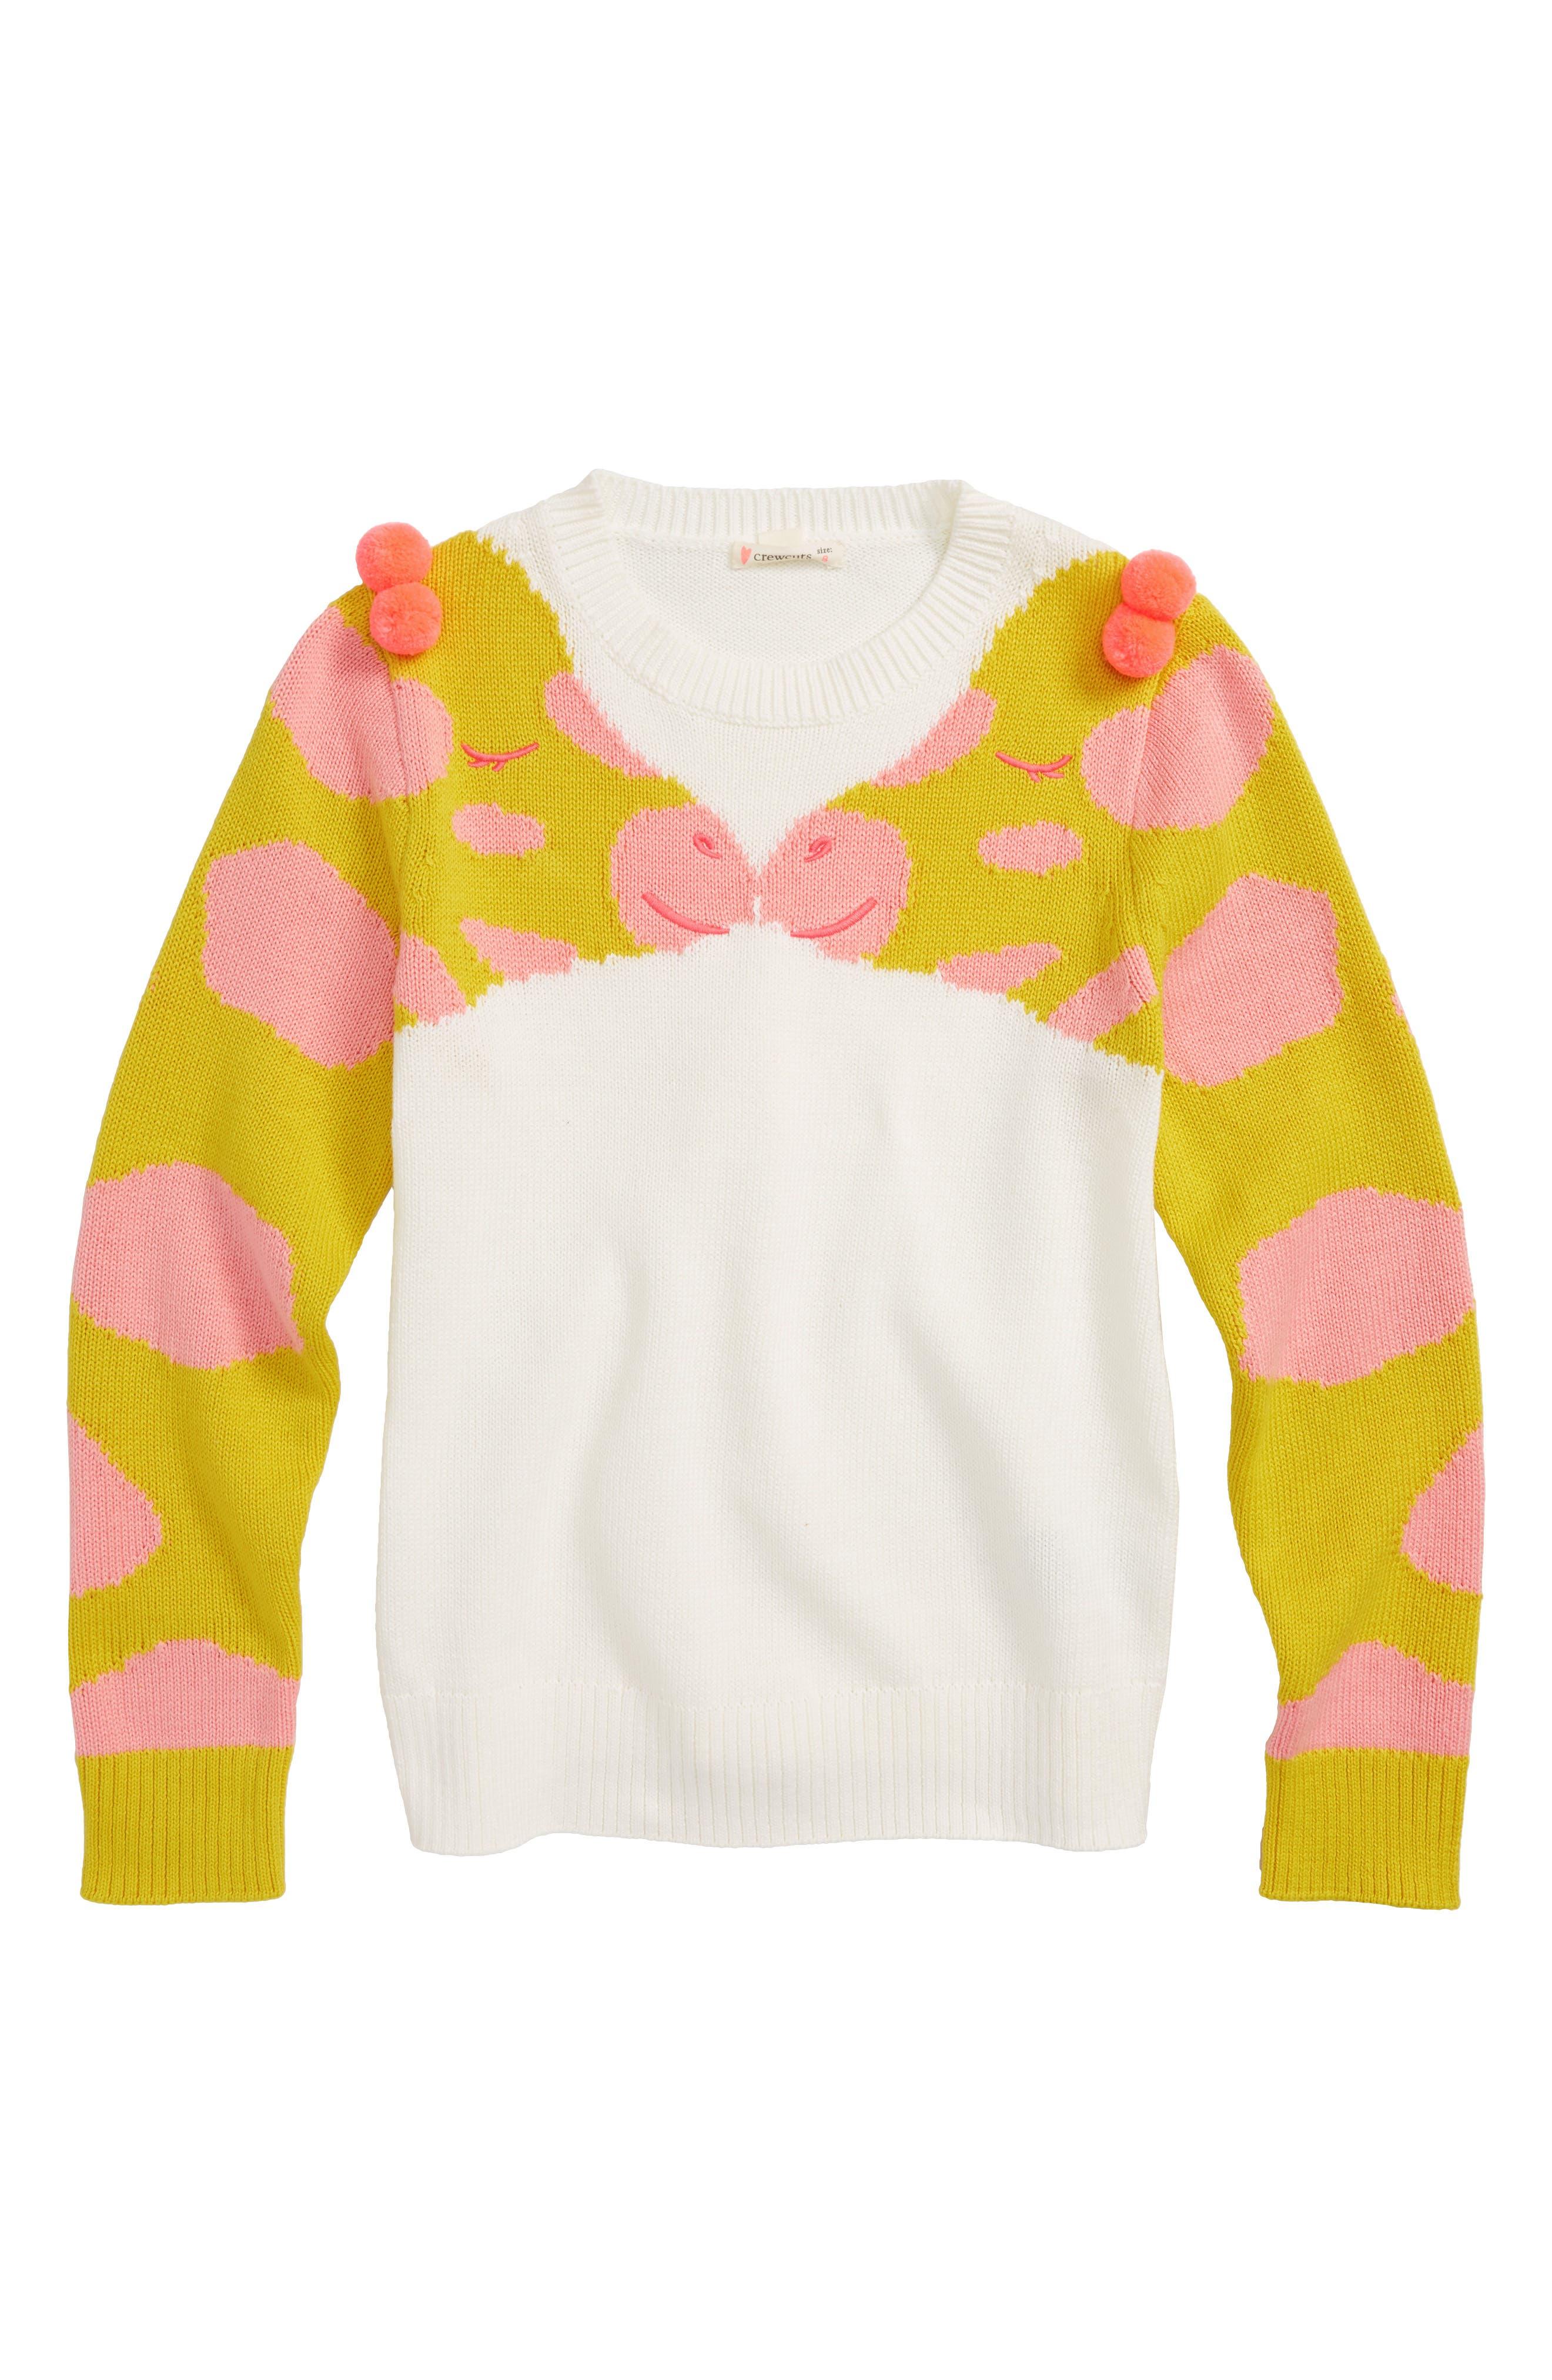 Giraffe Sweater,                             Main thumbnail 1, color,                             IVORY MULTI